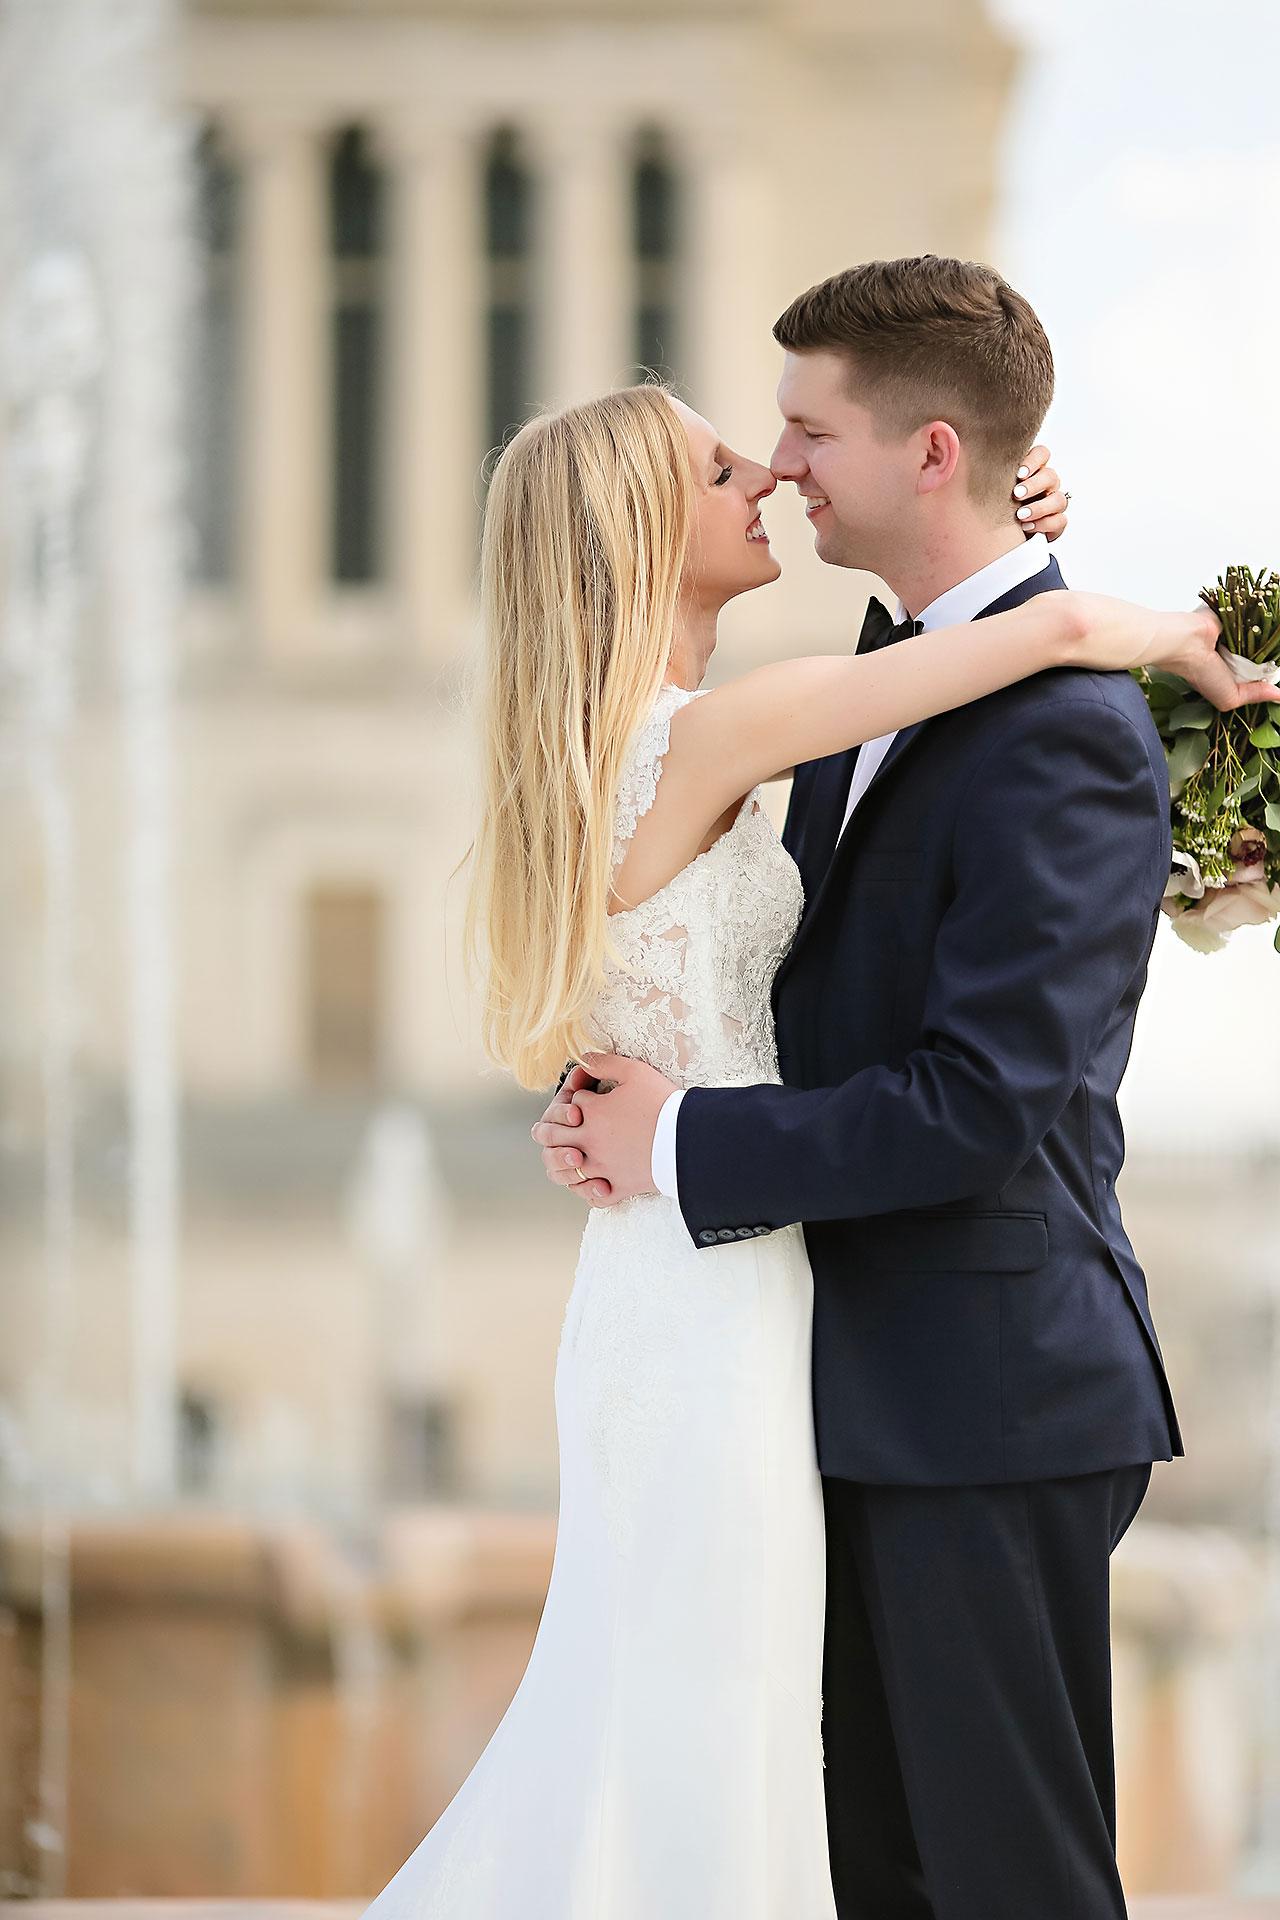 Molly Declan Scottish Rite Indianapolis Wedding 251